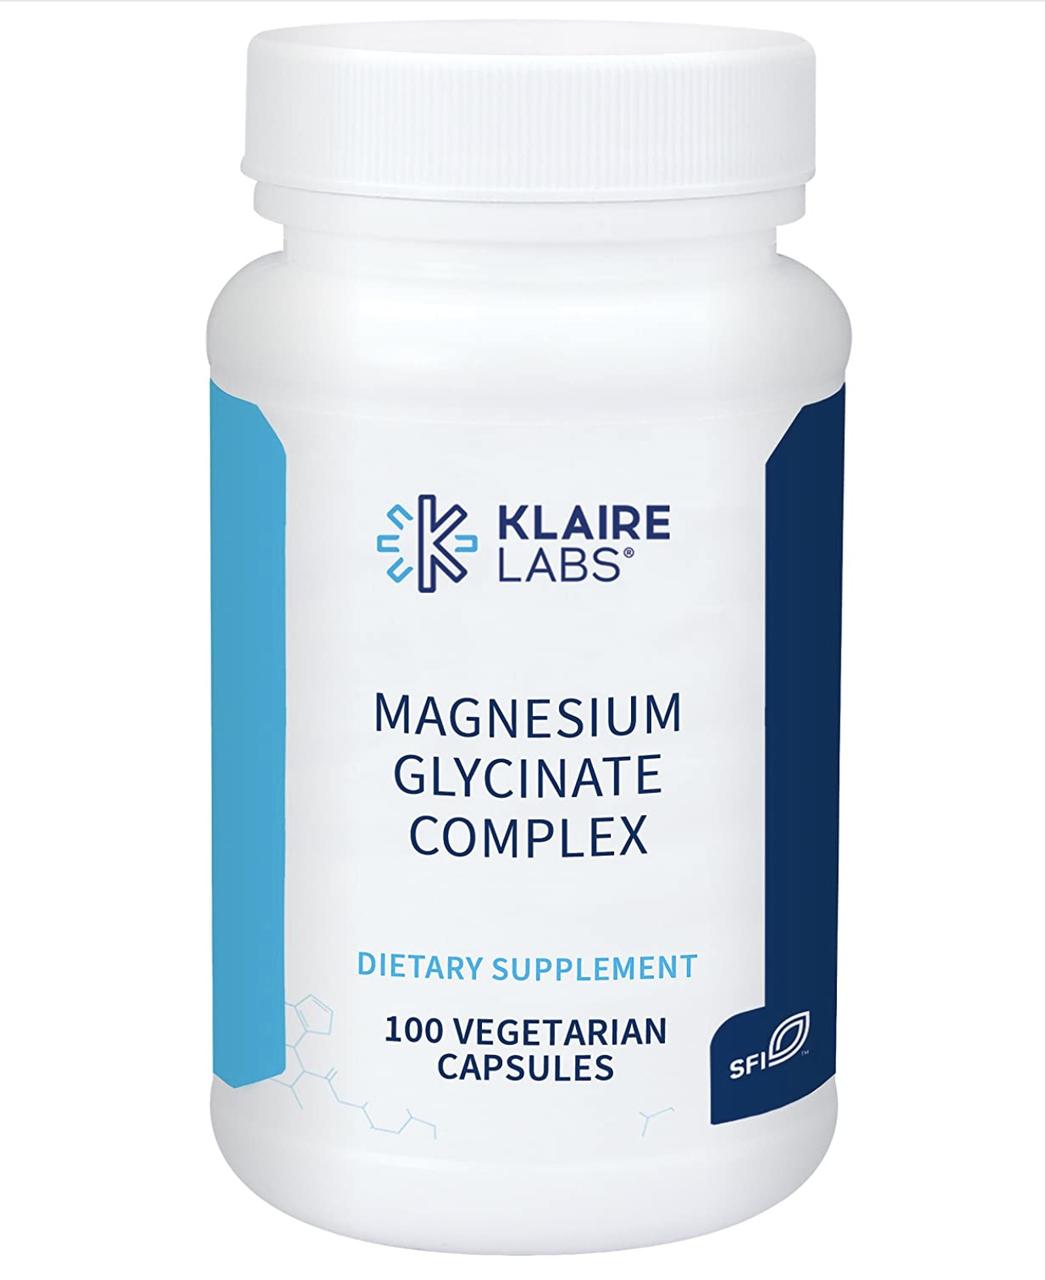 Klaire MAGNESIUM GLYCINATE COMPLEX / Магний глицинат комплекс 100 капс.